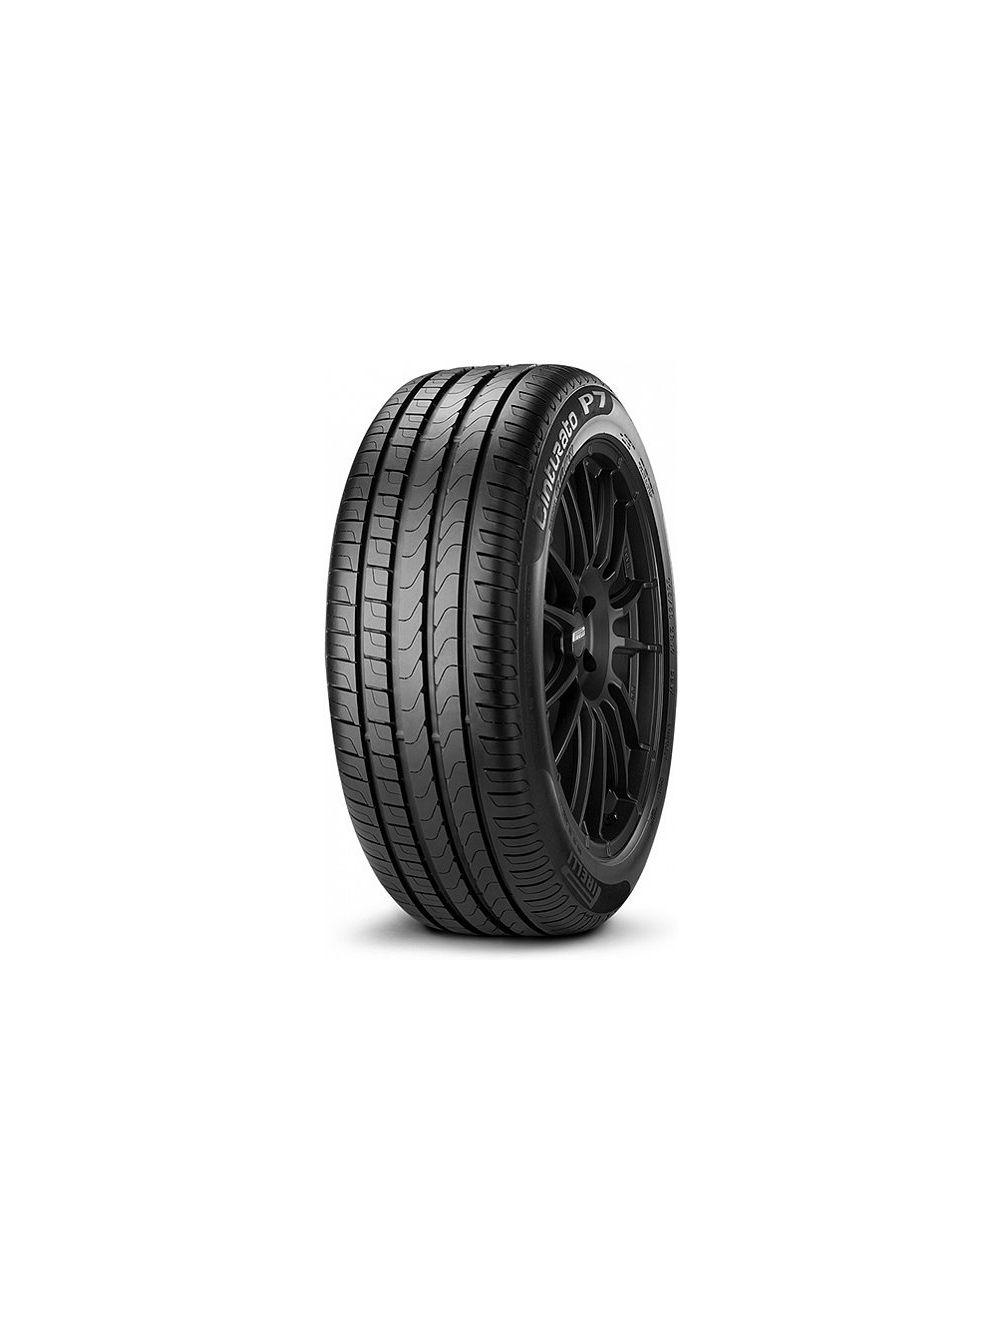 Pirelli 245/50R19 W P7 Cinturato XL RunFlat * Nyári gumi